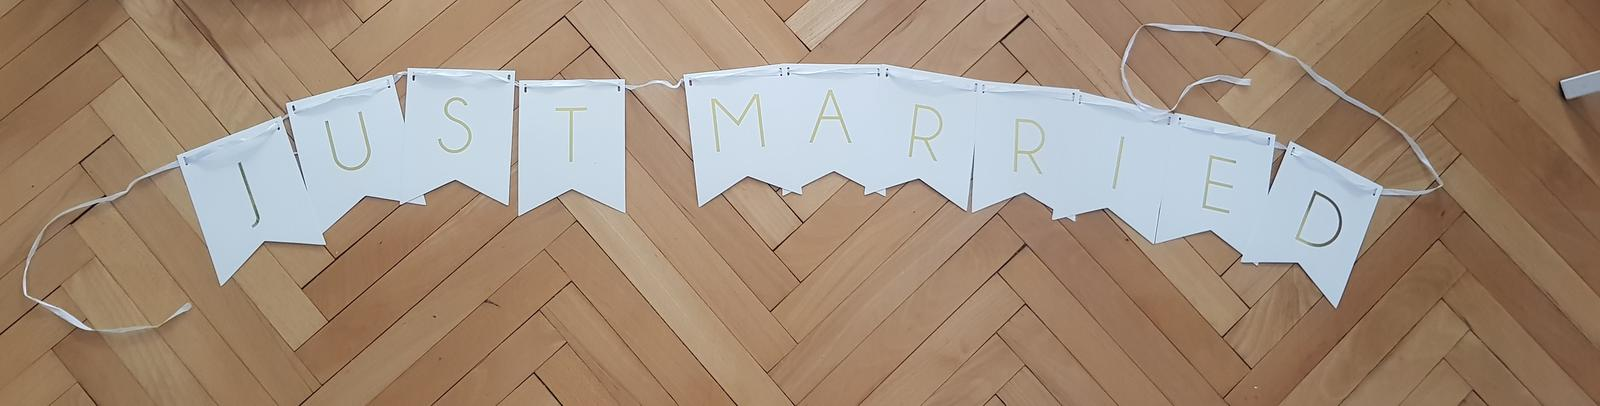 Girlanda Just Married - Obrázok č. 1